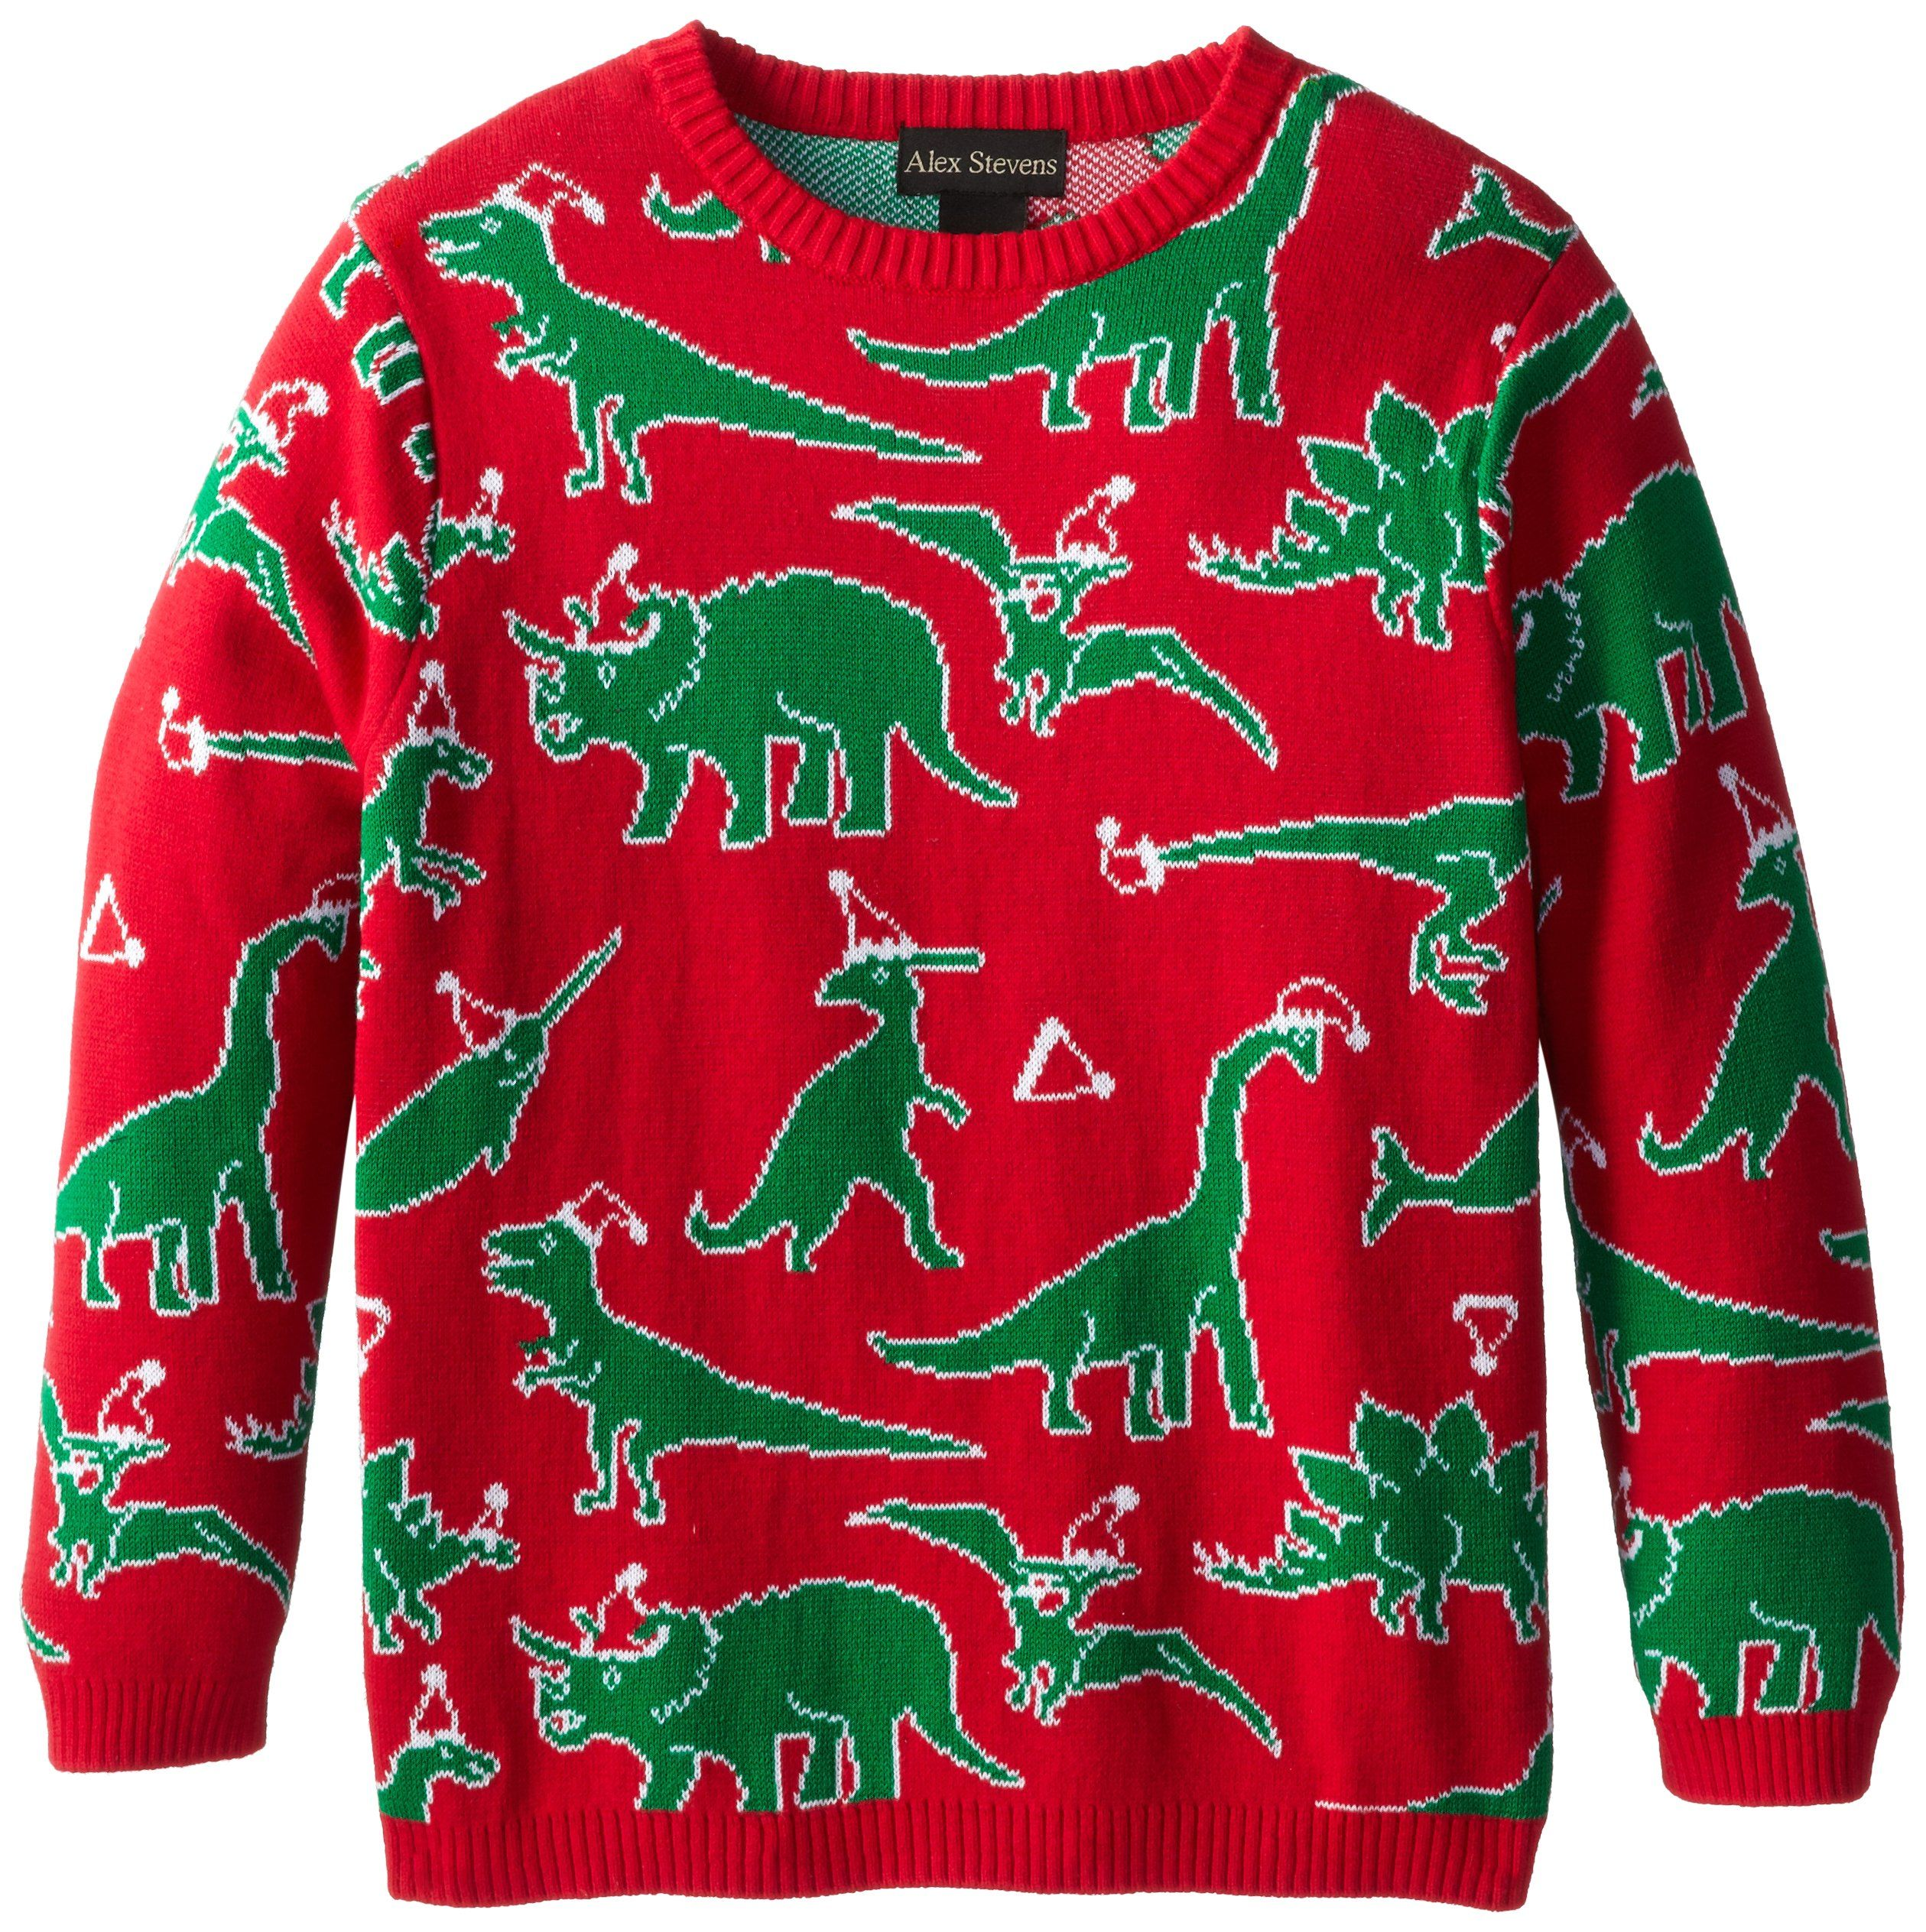 Pin on 🎅 Christmas Sweater